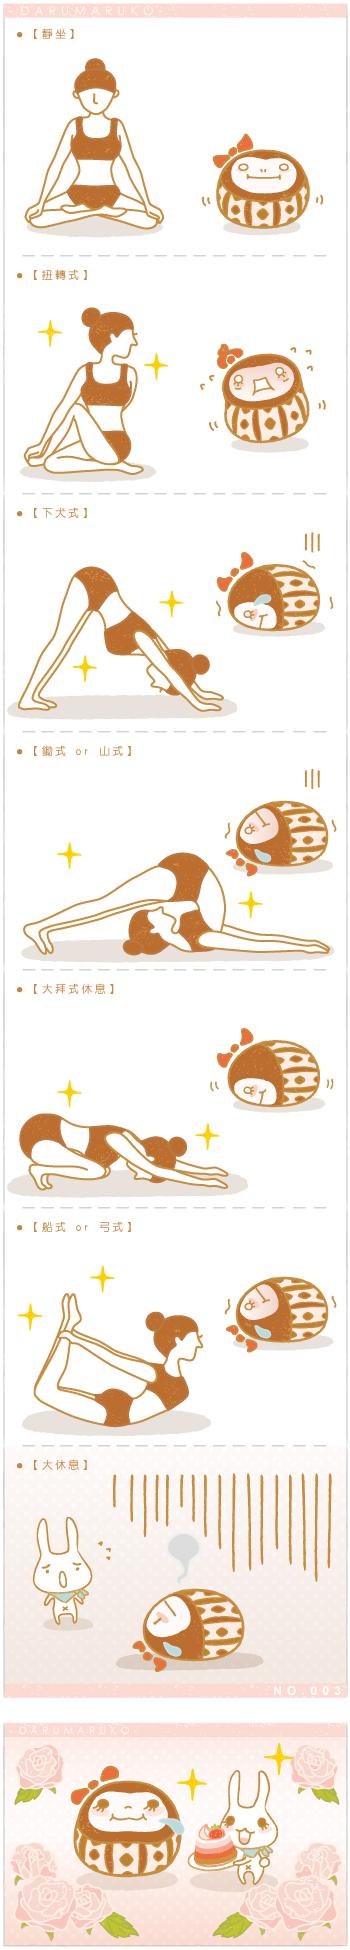 Darumaruko_yonnkoma003_1.jpg